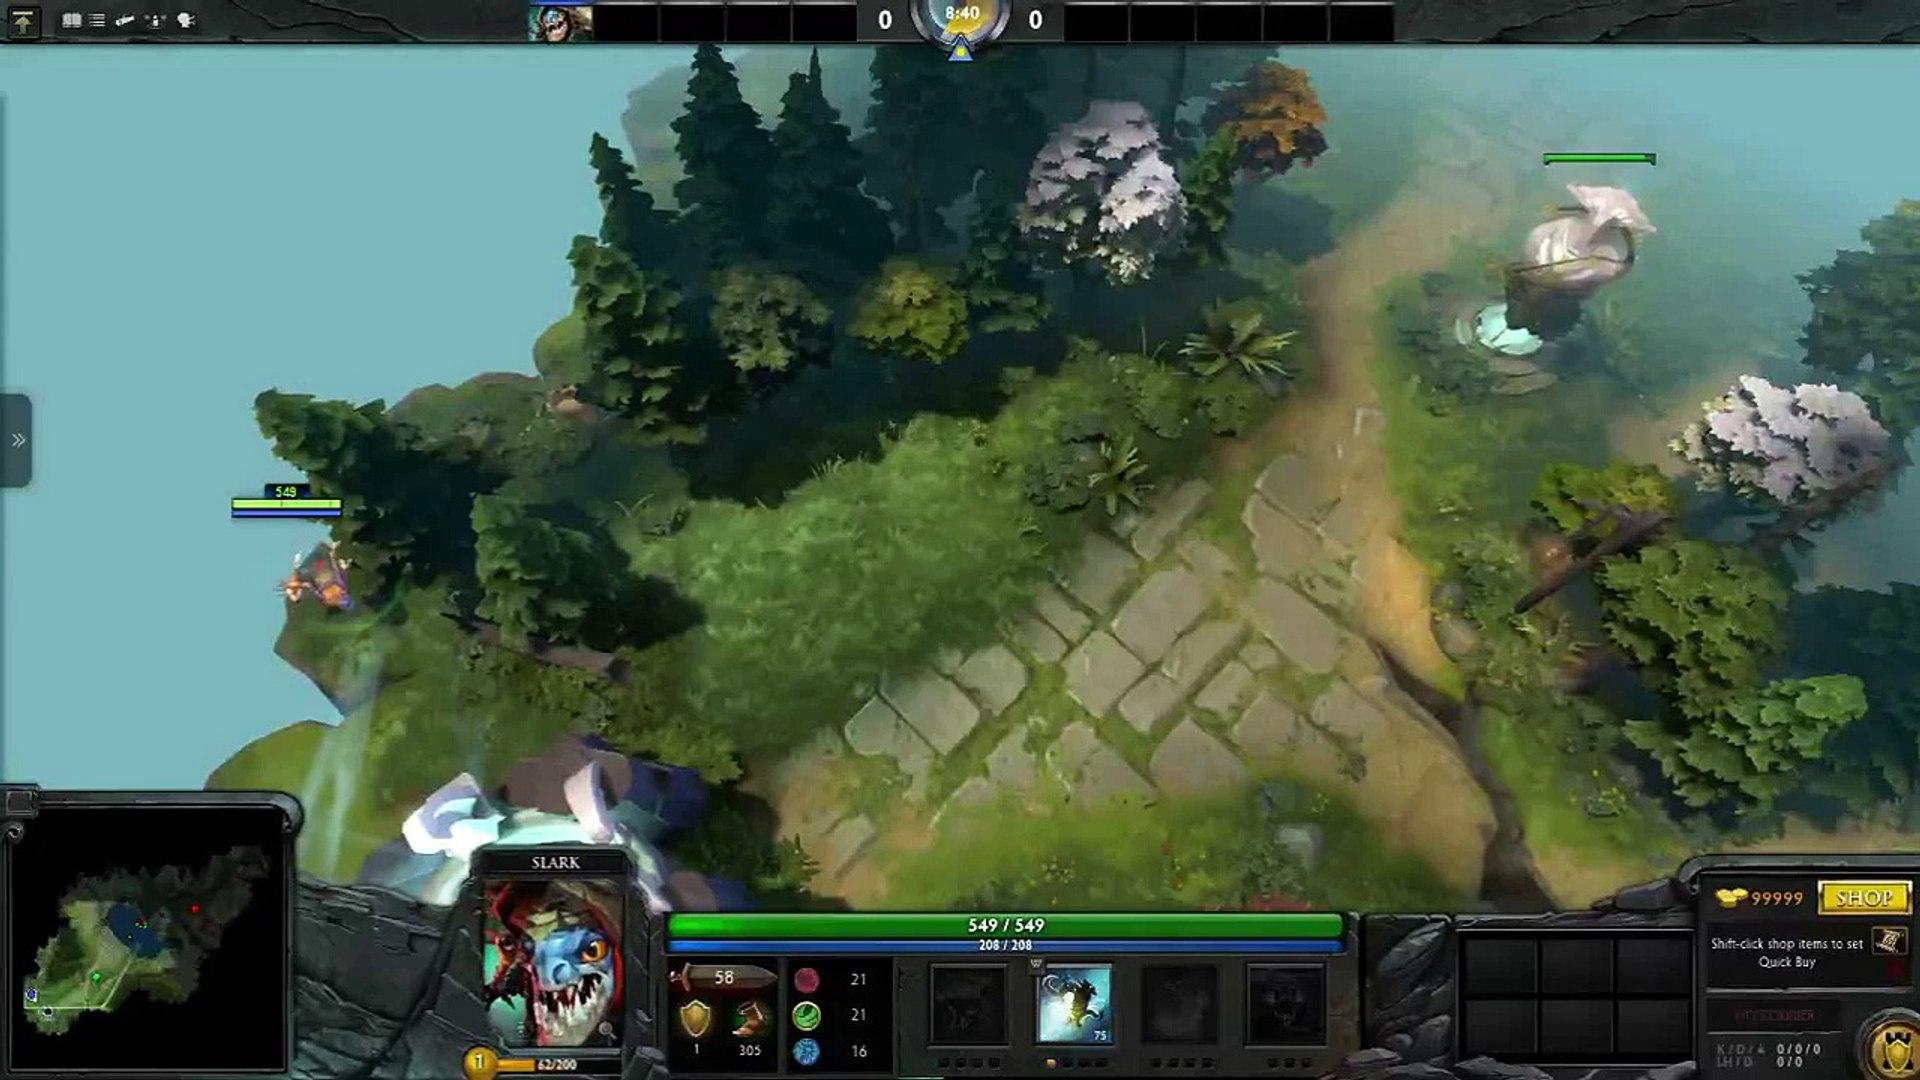 Dota 2 Reborn Demo Hero Bug (Slark)